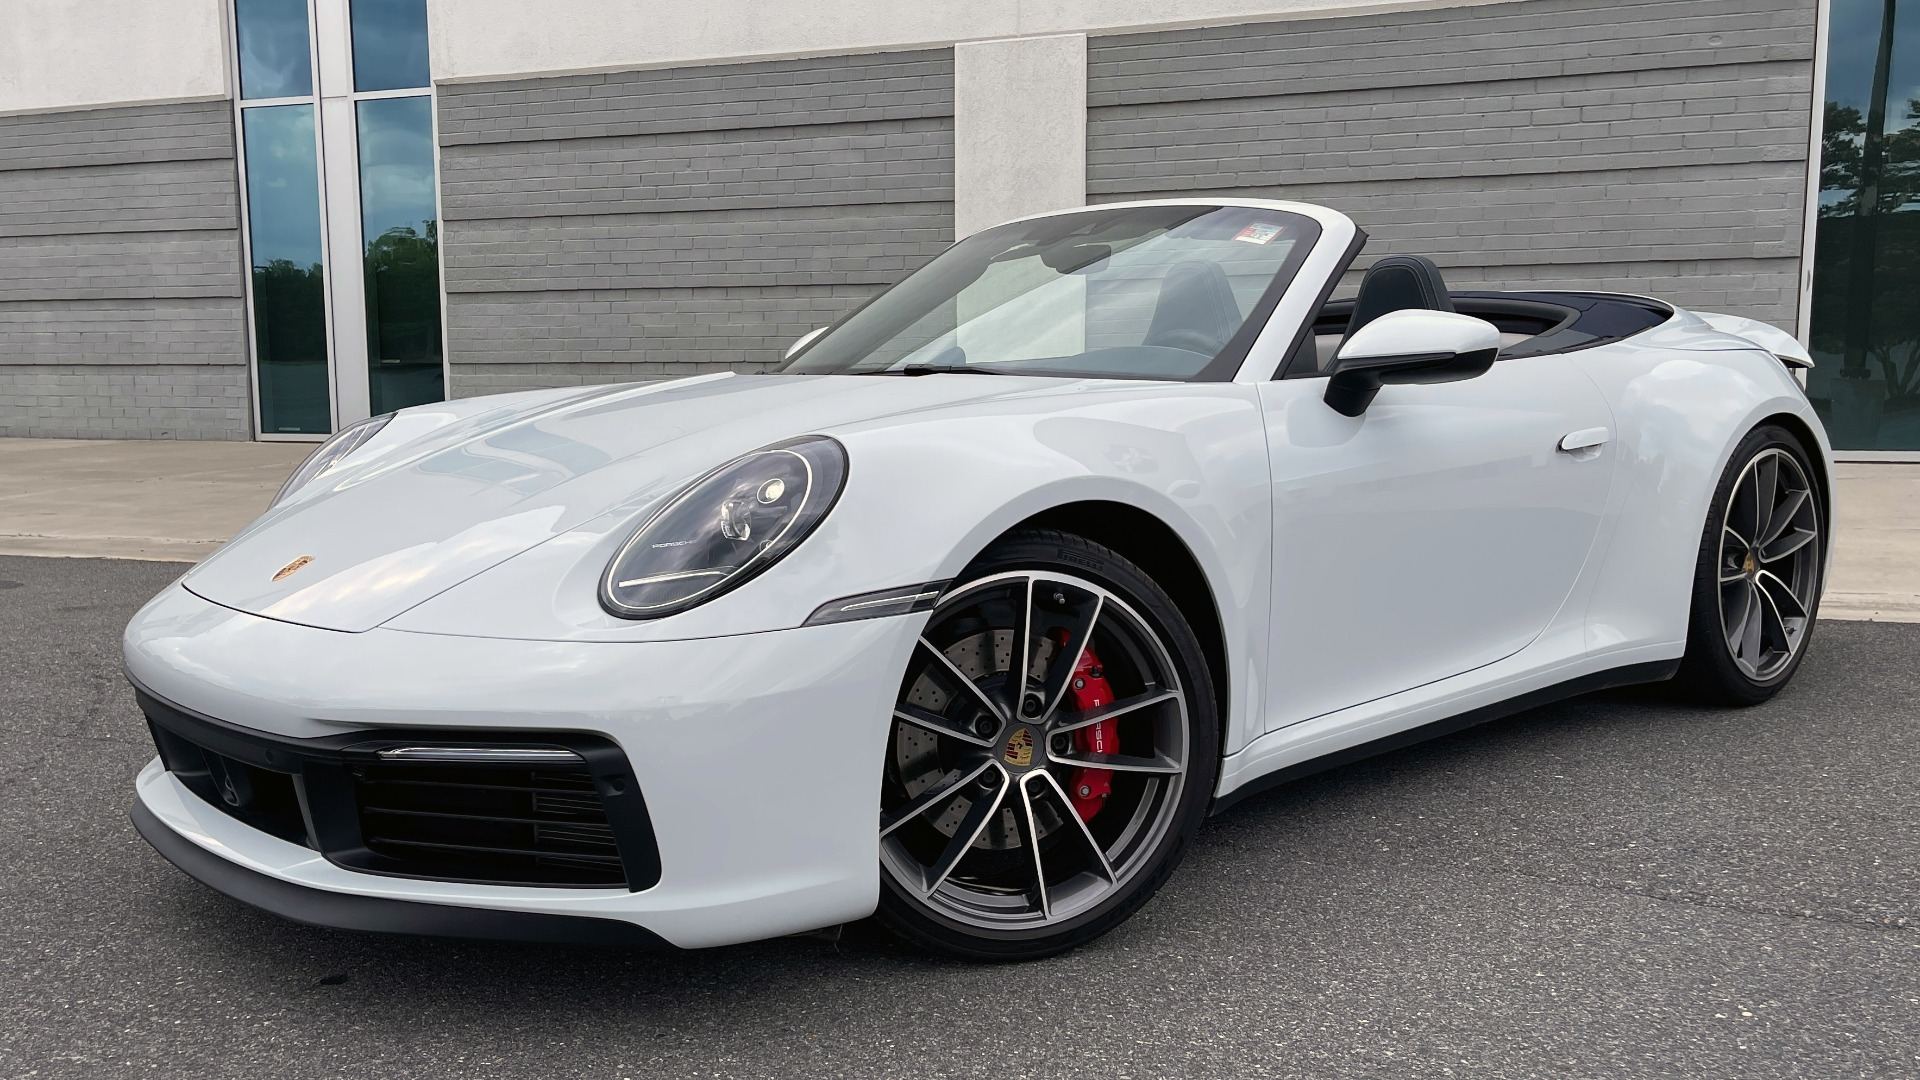 Used 2020 Porsche 911 CARRERA 4S CABRIOLET PREMIUM SPORT PKG / NAV / BOSE / LIGHT DESIGN PKG for sale $167,595 at Formula Imports in Charlotte NC 28227 1